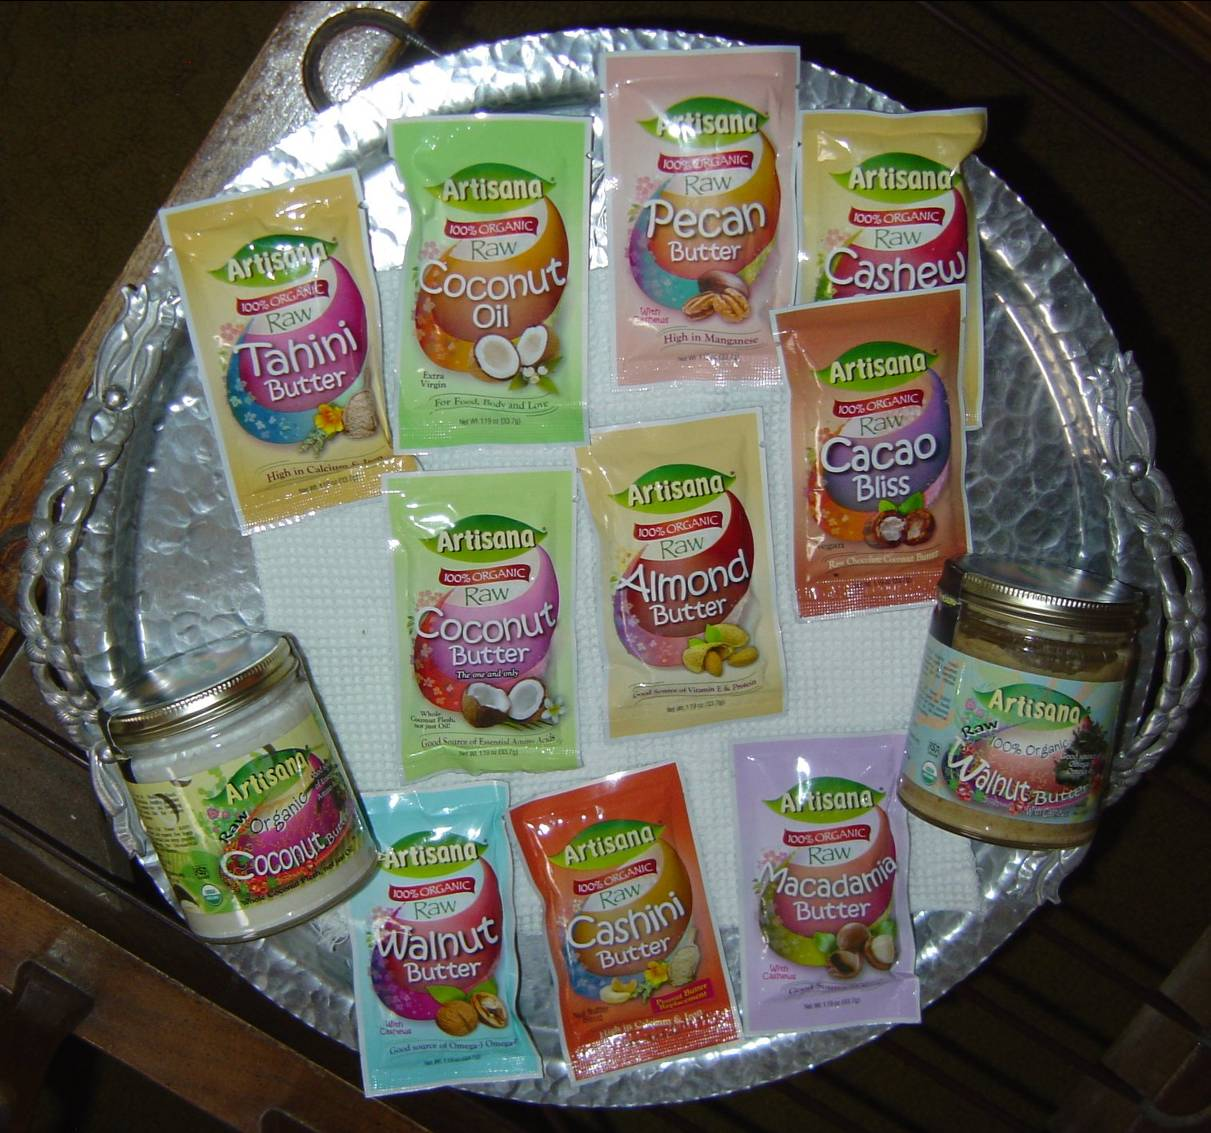 Artisana Organics Nut Butters